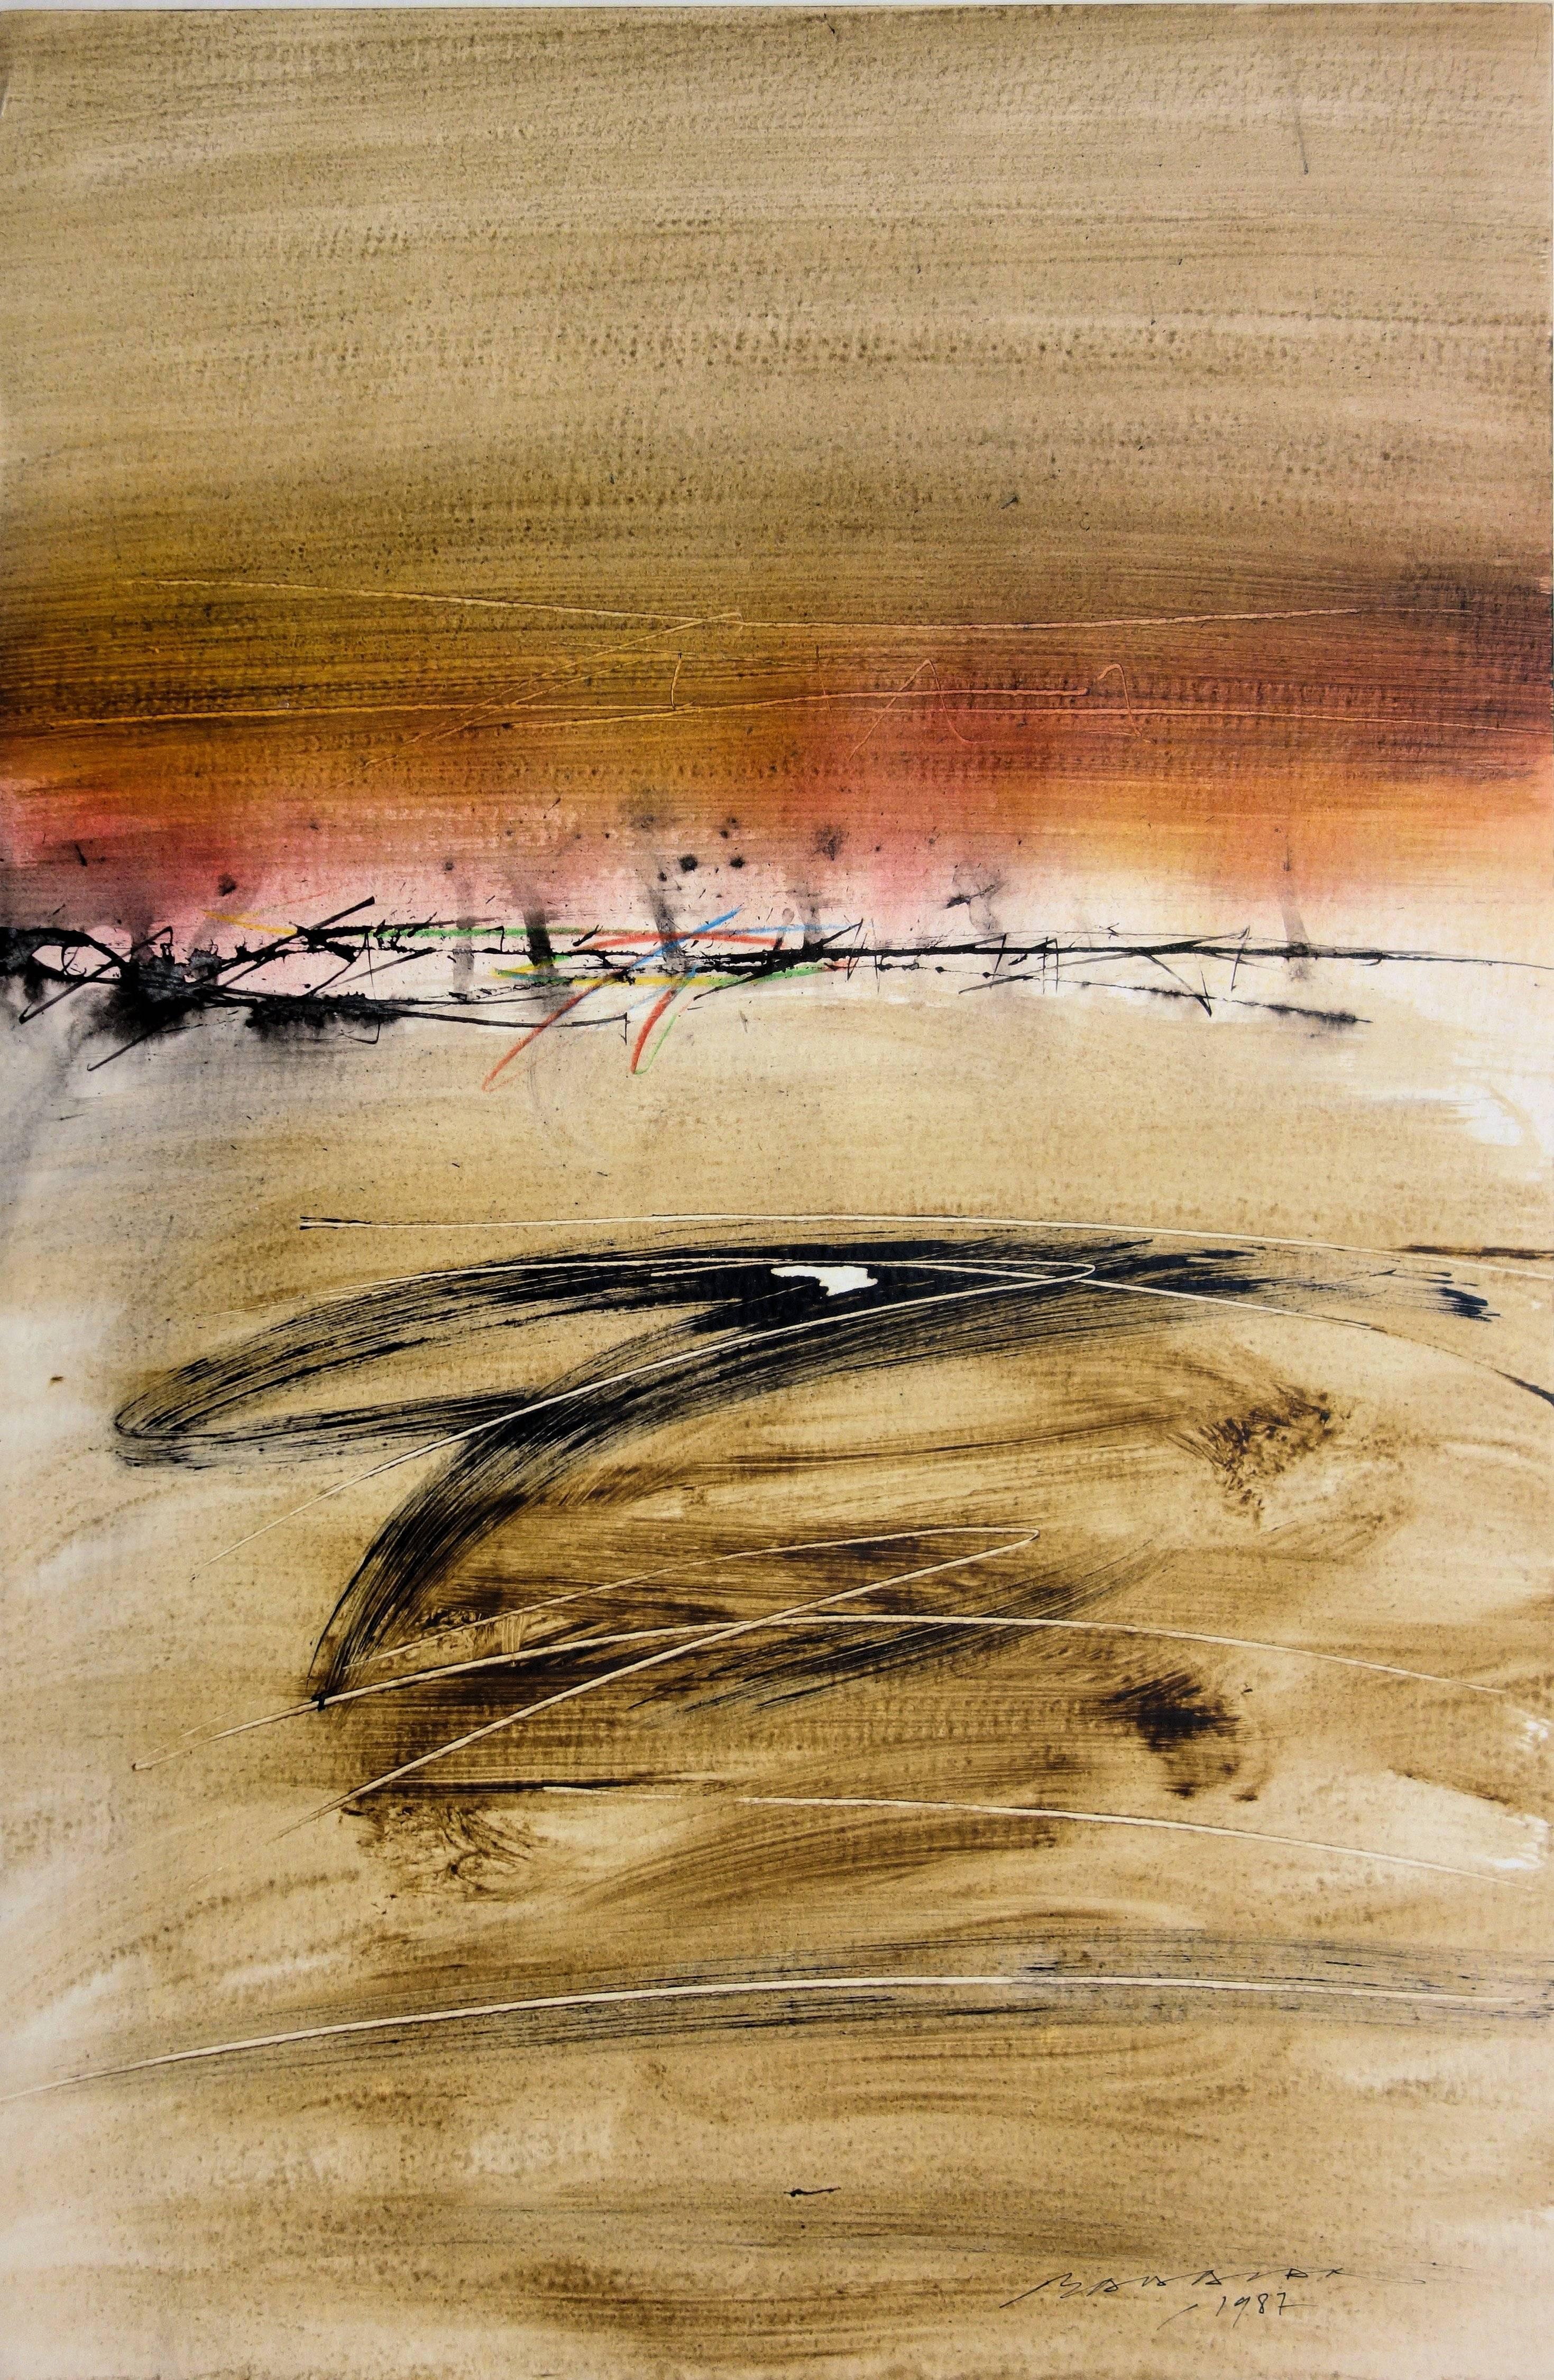 Desert - Original painting on paper - Handsigned